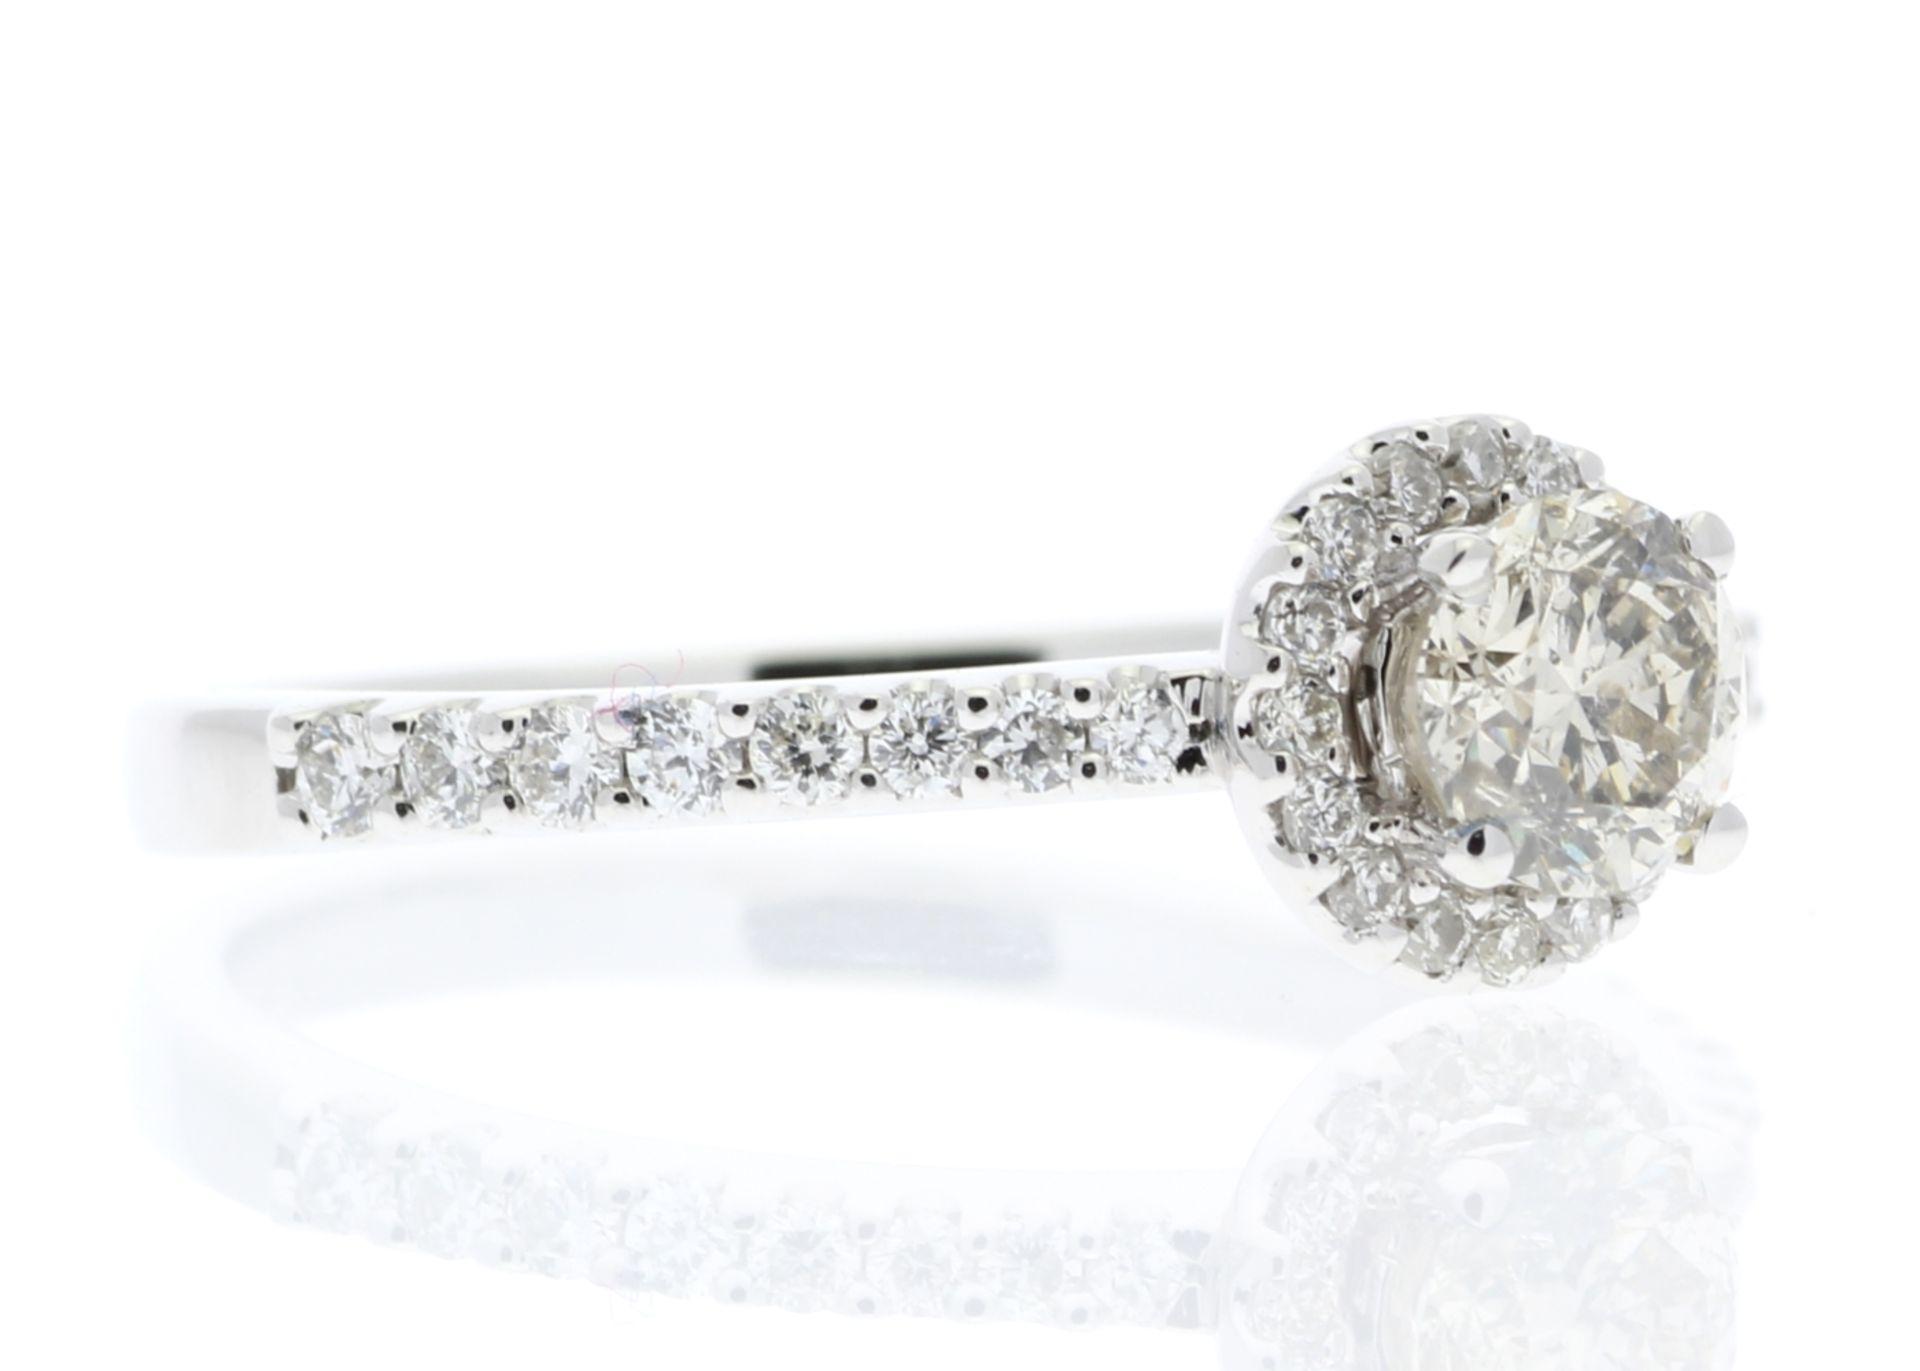 18ct White Gold Single Stone Halo Set With Stone Set Shoulders Diamond Ring (0.25) 0.52 Carats - - Image 4 of 4